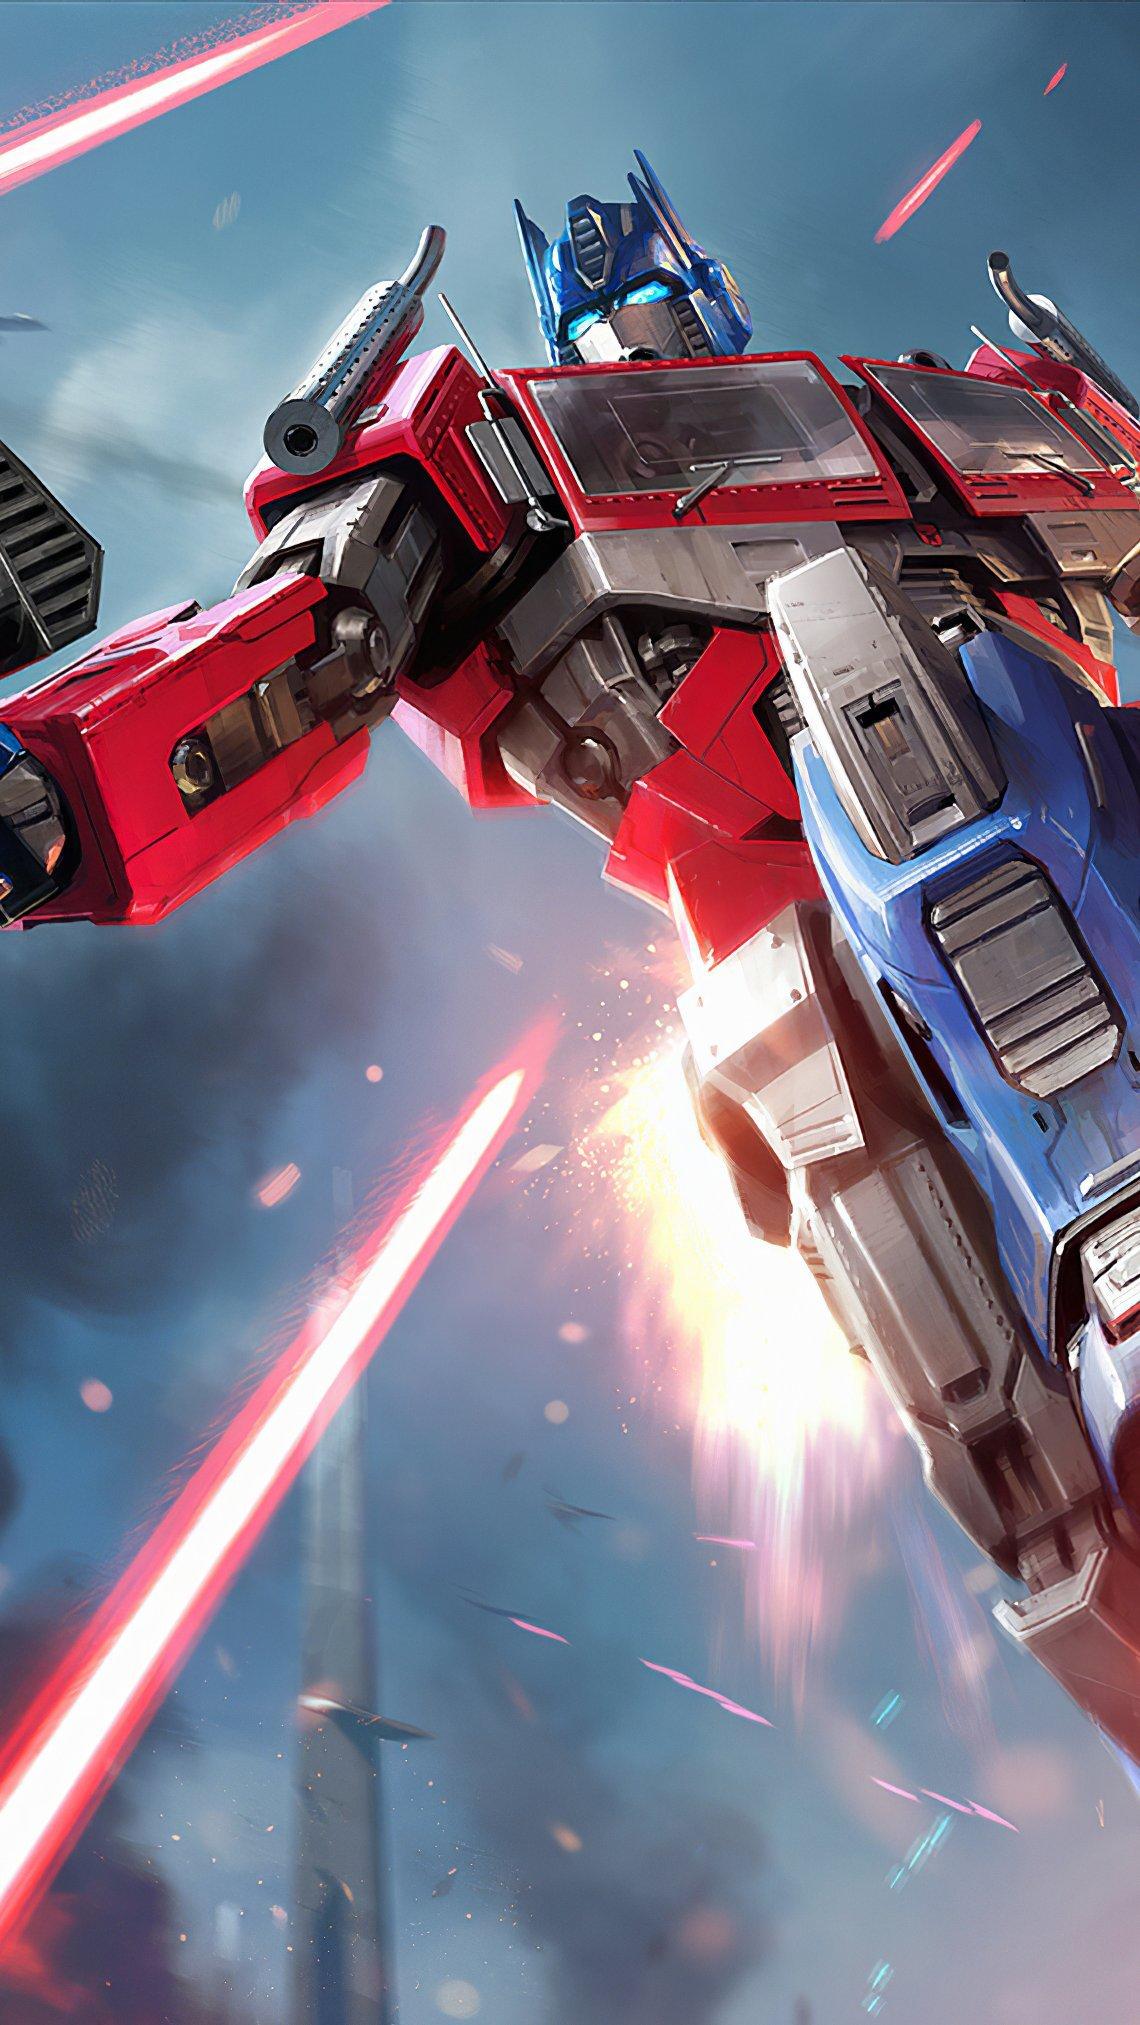 Wallpaper Optimus Prime peleando Vertical